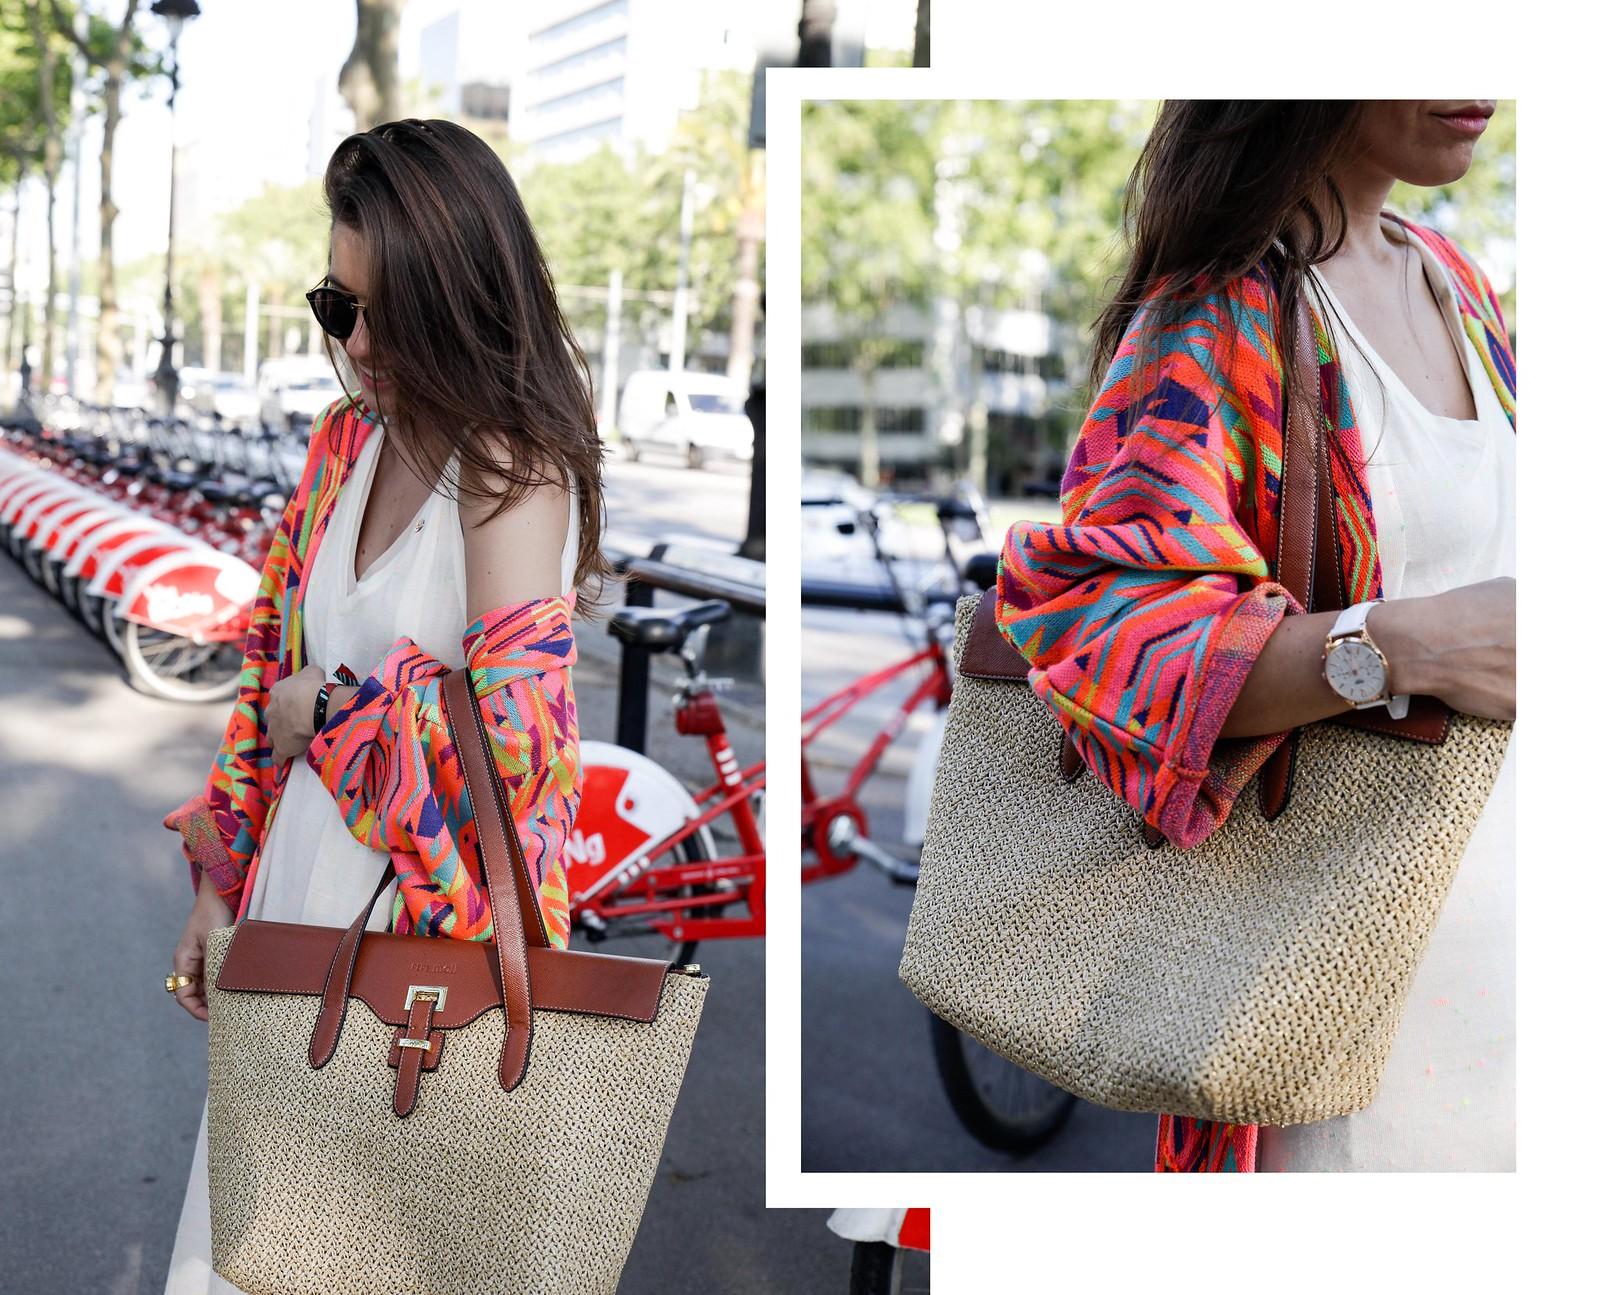 09_kimono_look_street_style_barcelona_theguestgirl_pepe_moll_ruga_caroline_svedbom_kapten_son